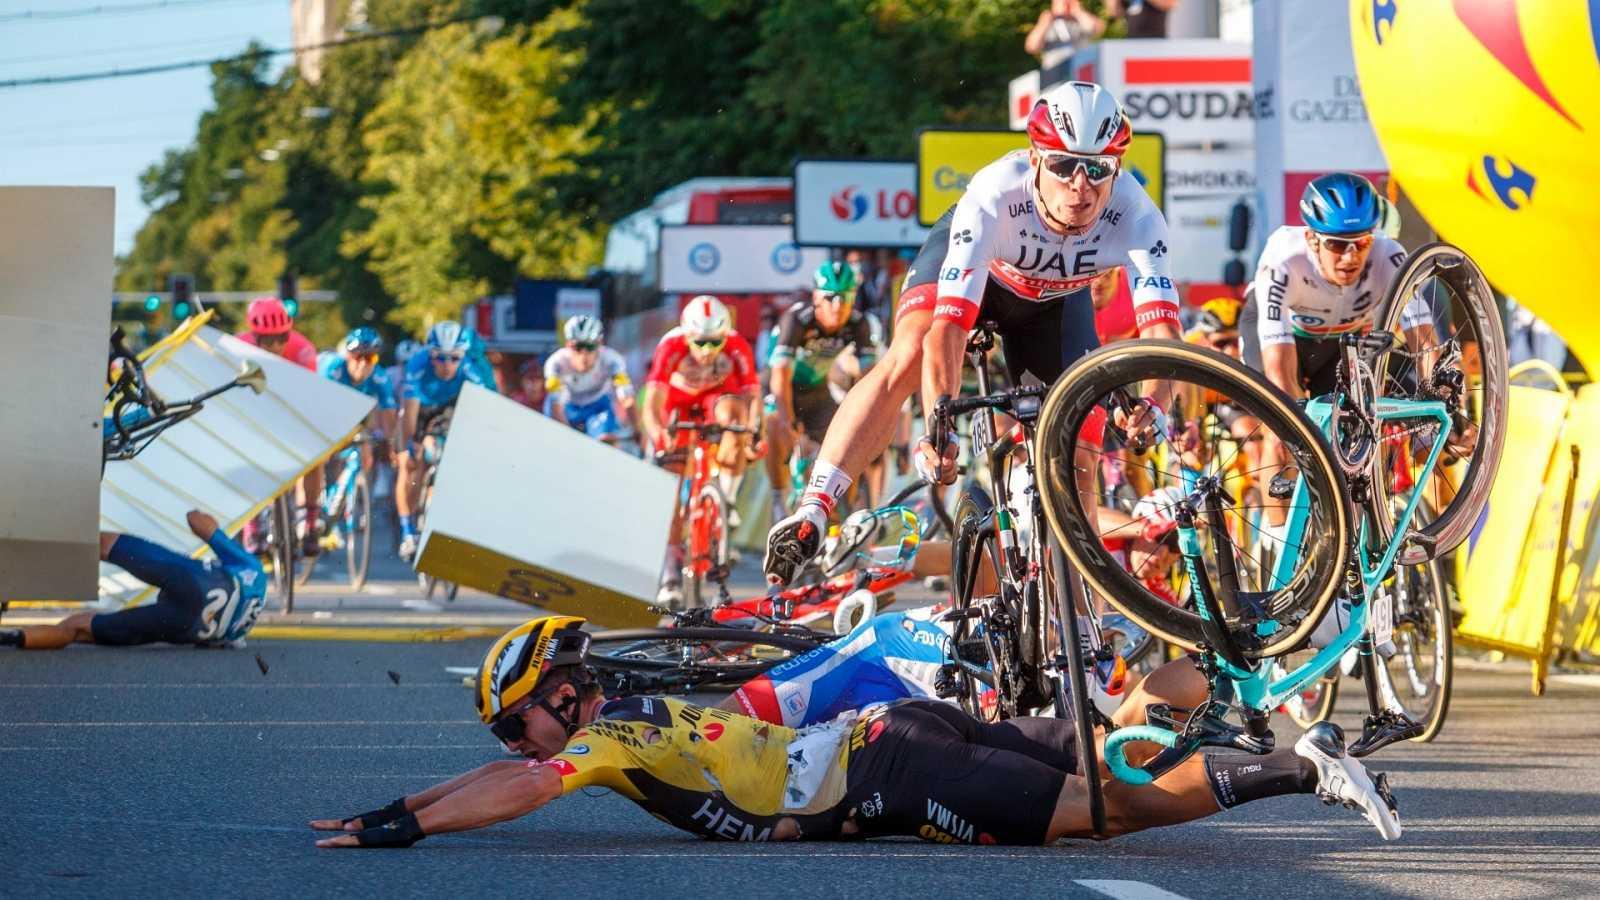 Imagen de la caída en la línea deImagen de la caída en la línea de meta de la primera etapa del Tour de Polonia meta de la primera etapa del Tour de Polonia